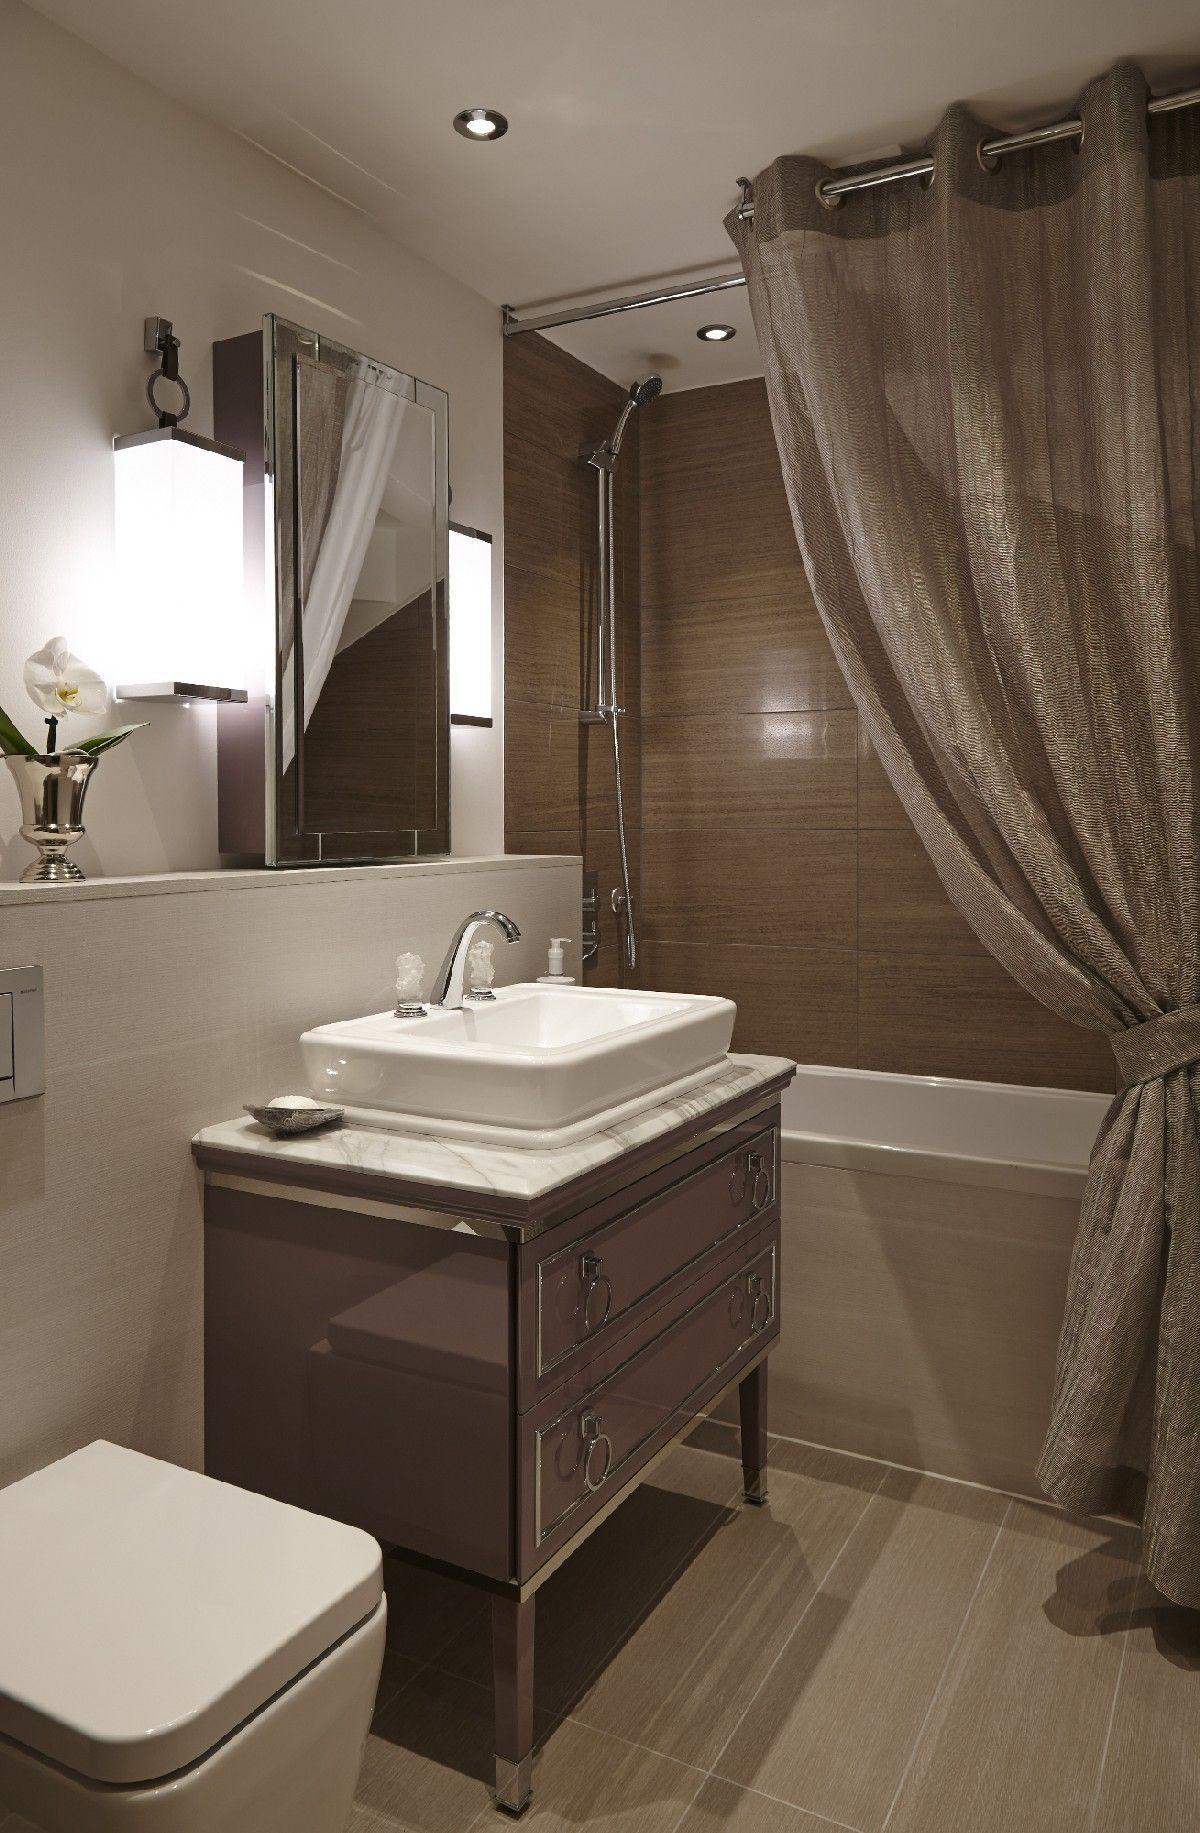 Luxurious urban oasis in london designed for entertaining bathroom